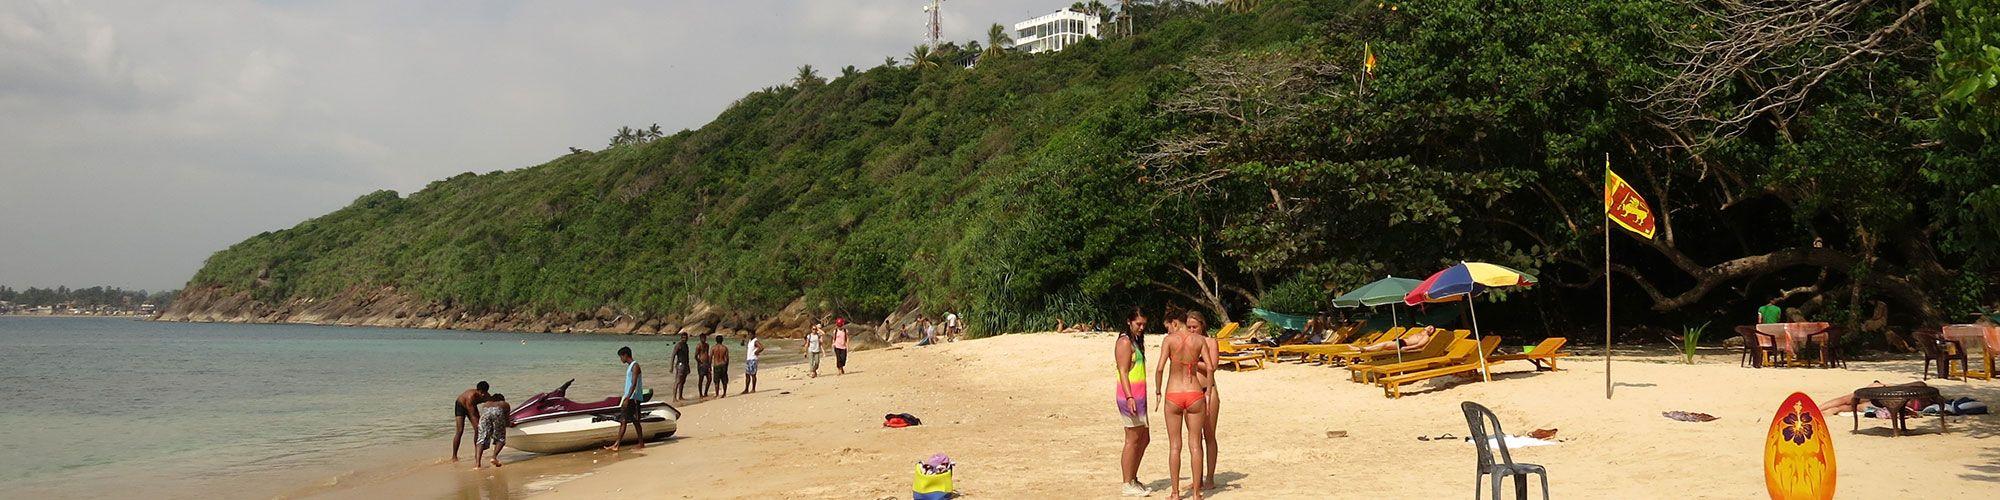 Sri Lanka, Galle, Jungle Beach